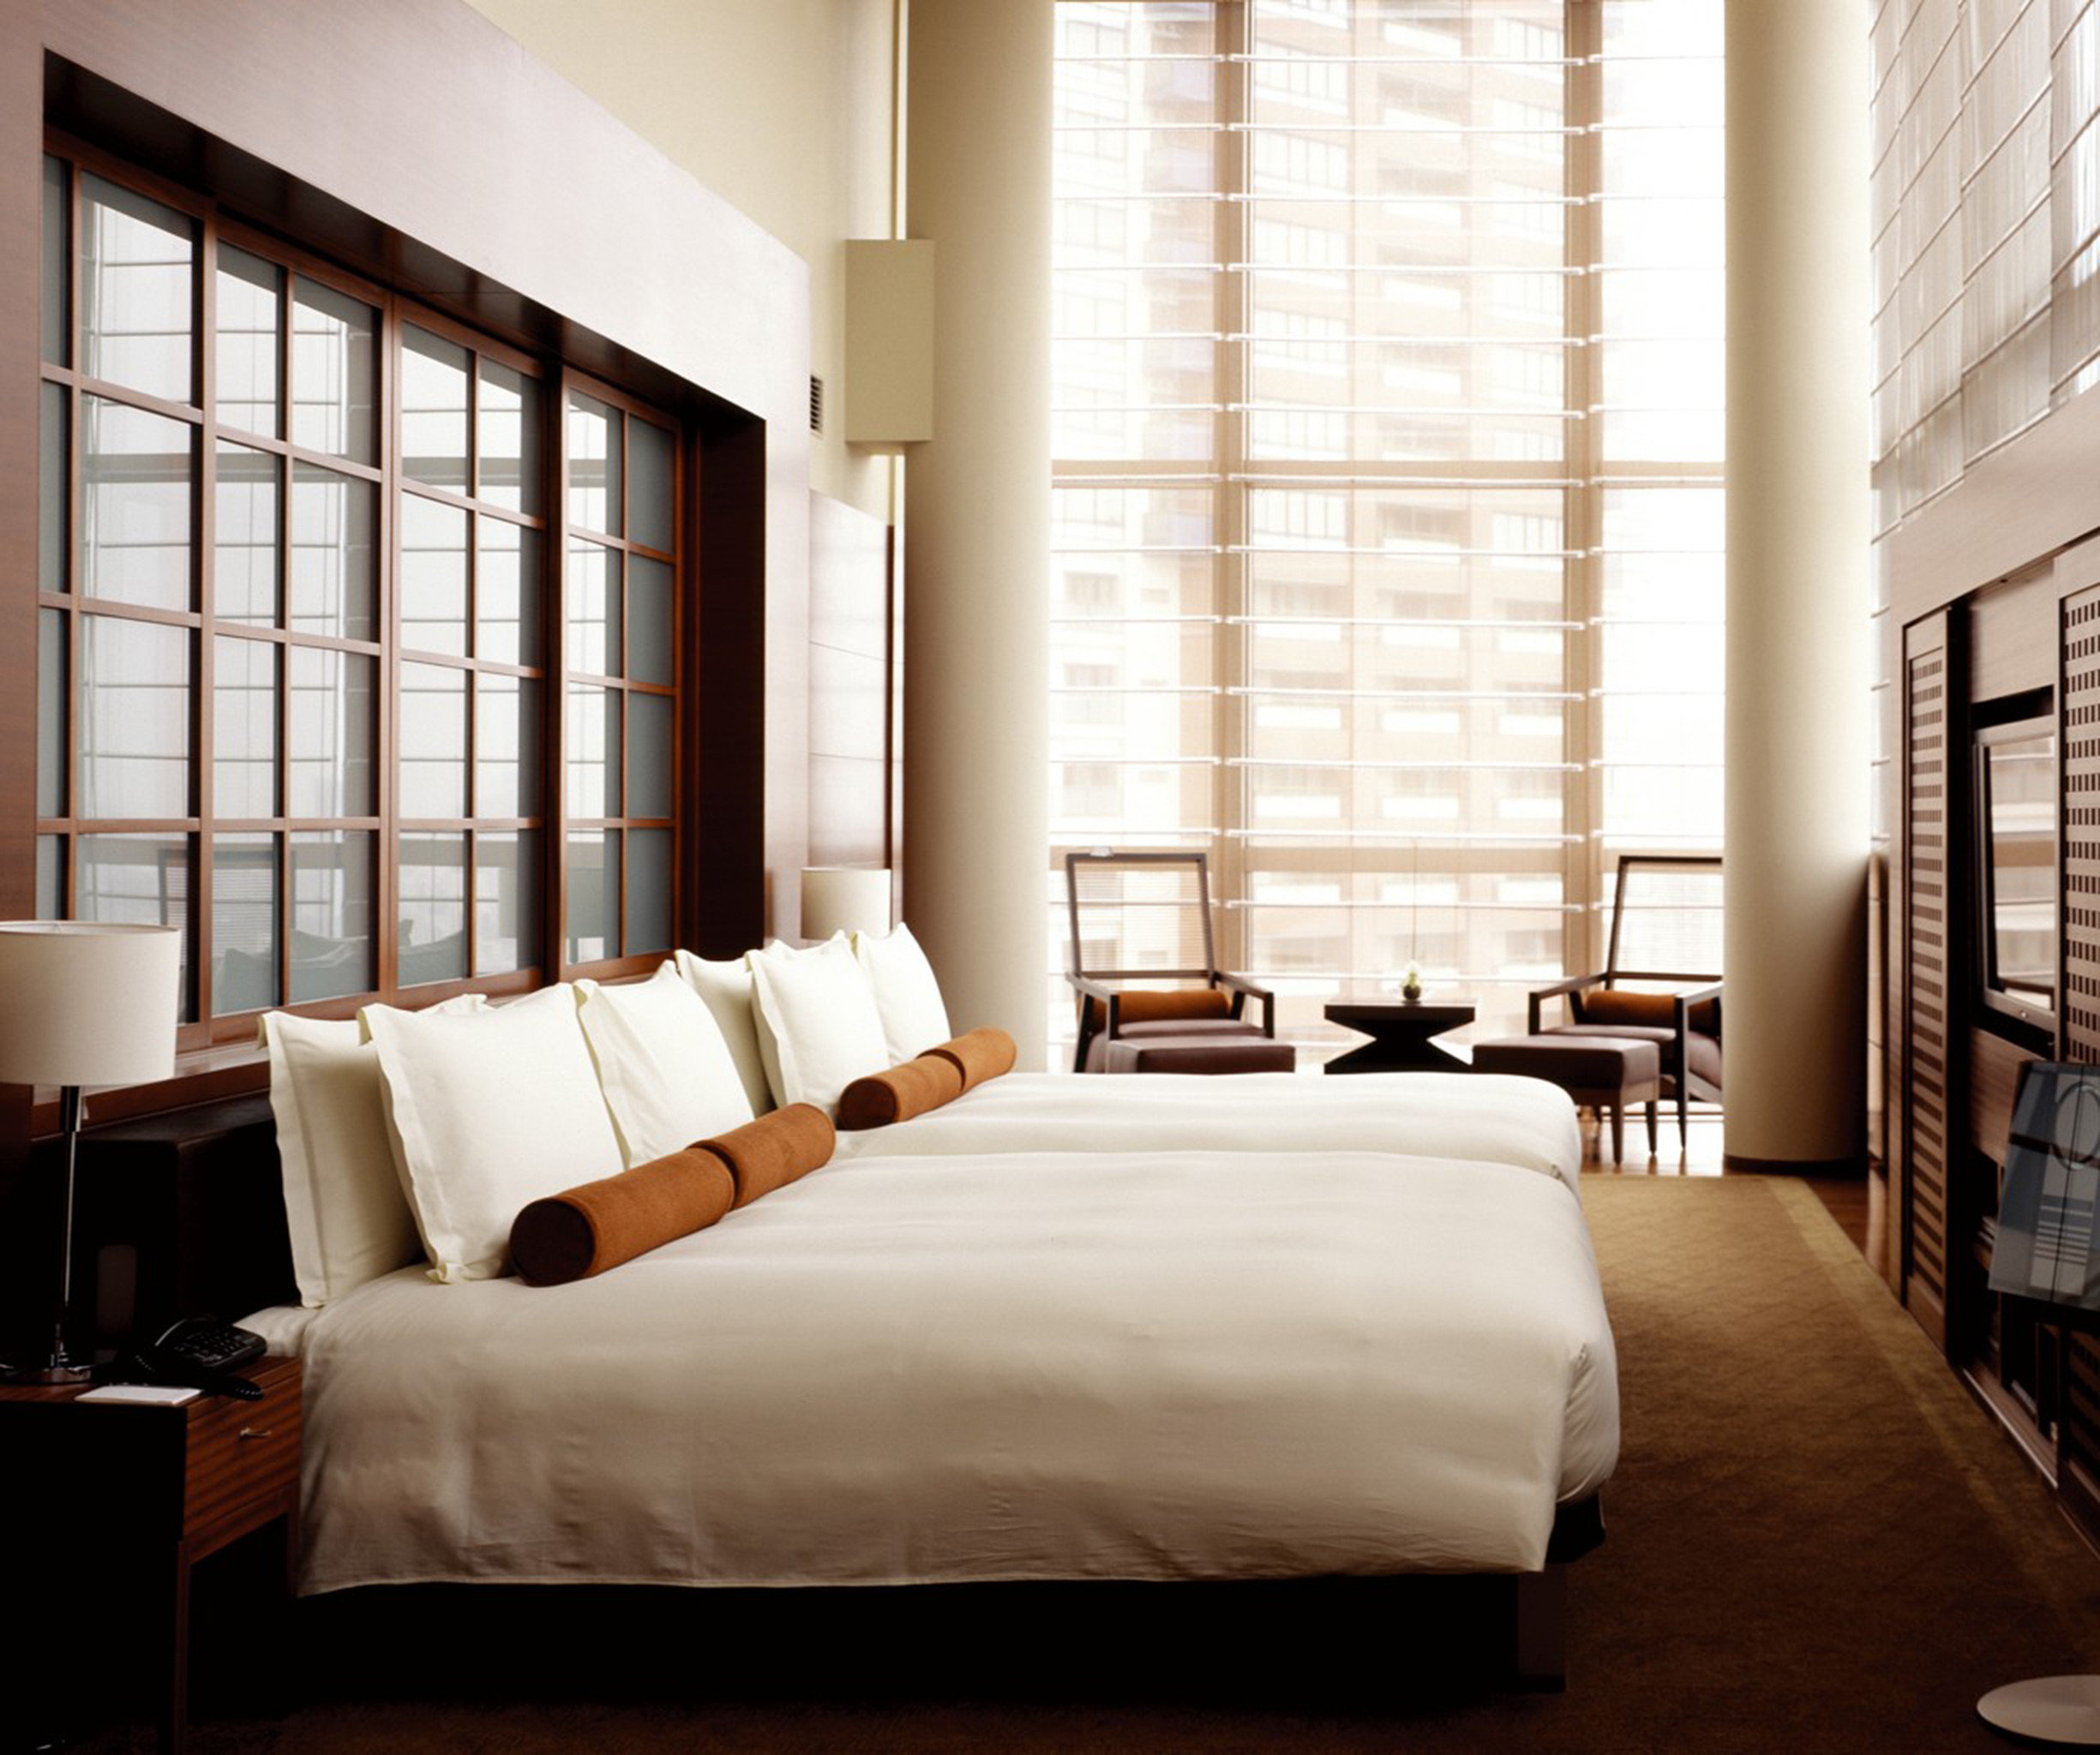 Bedroom City Modern Suite sofa property living room home condominium